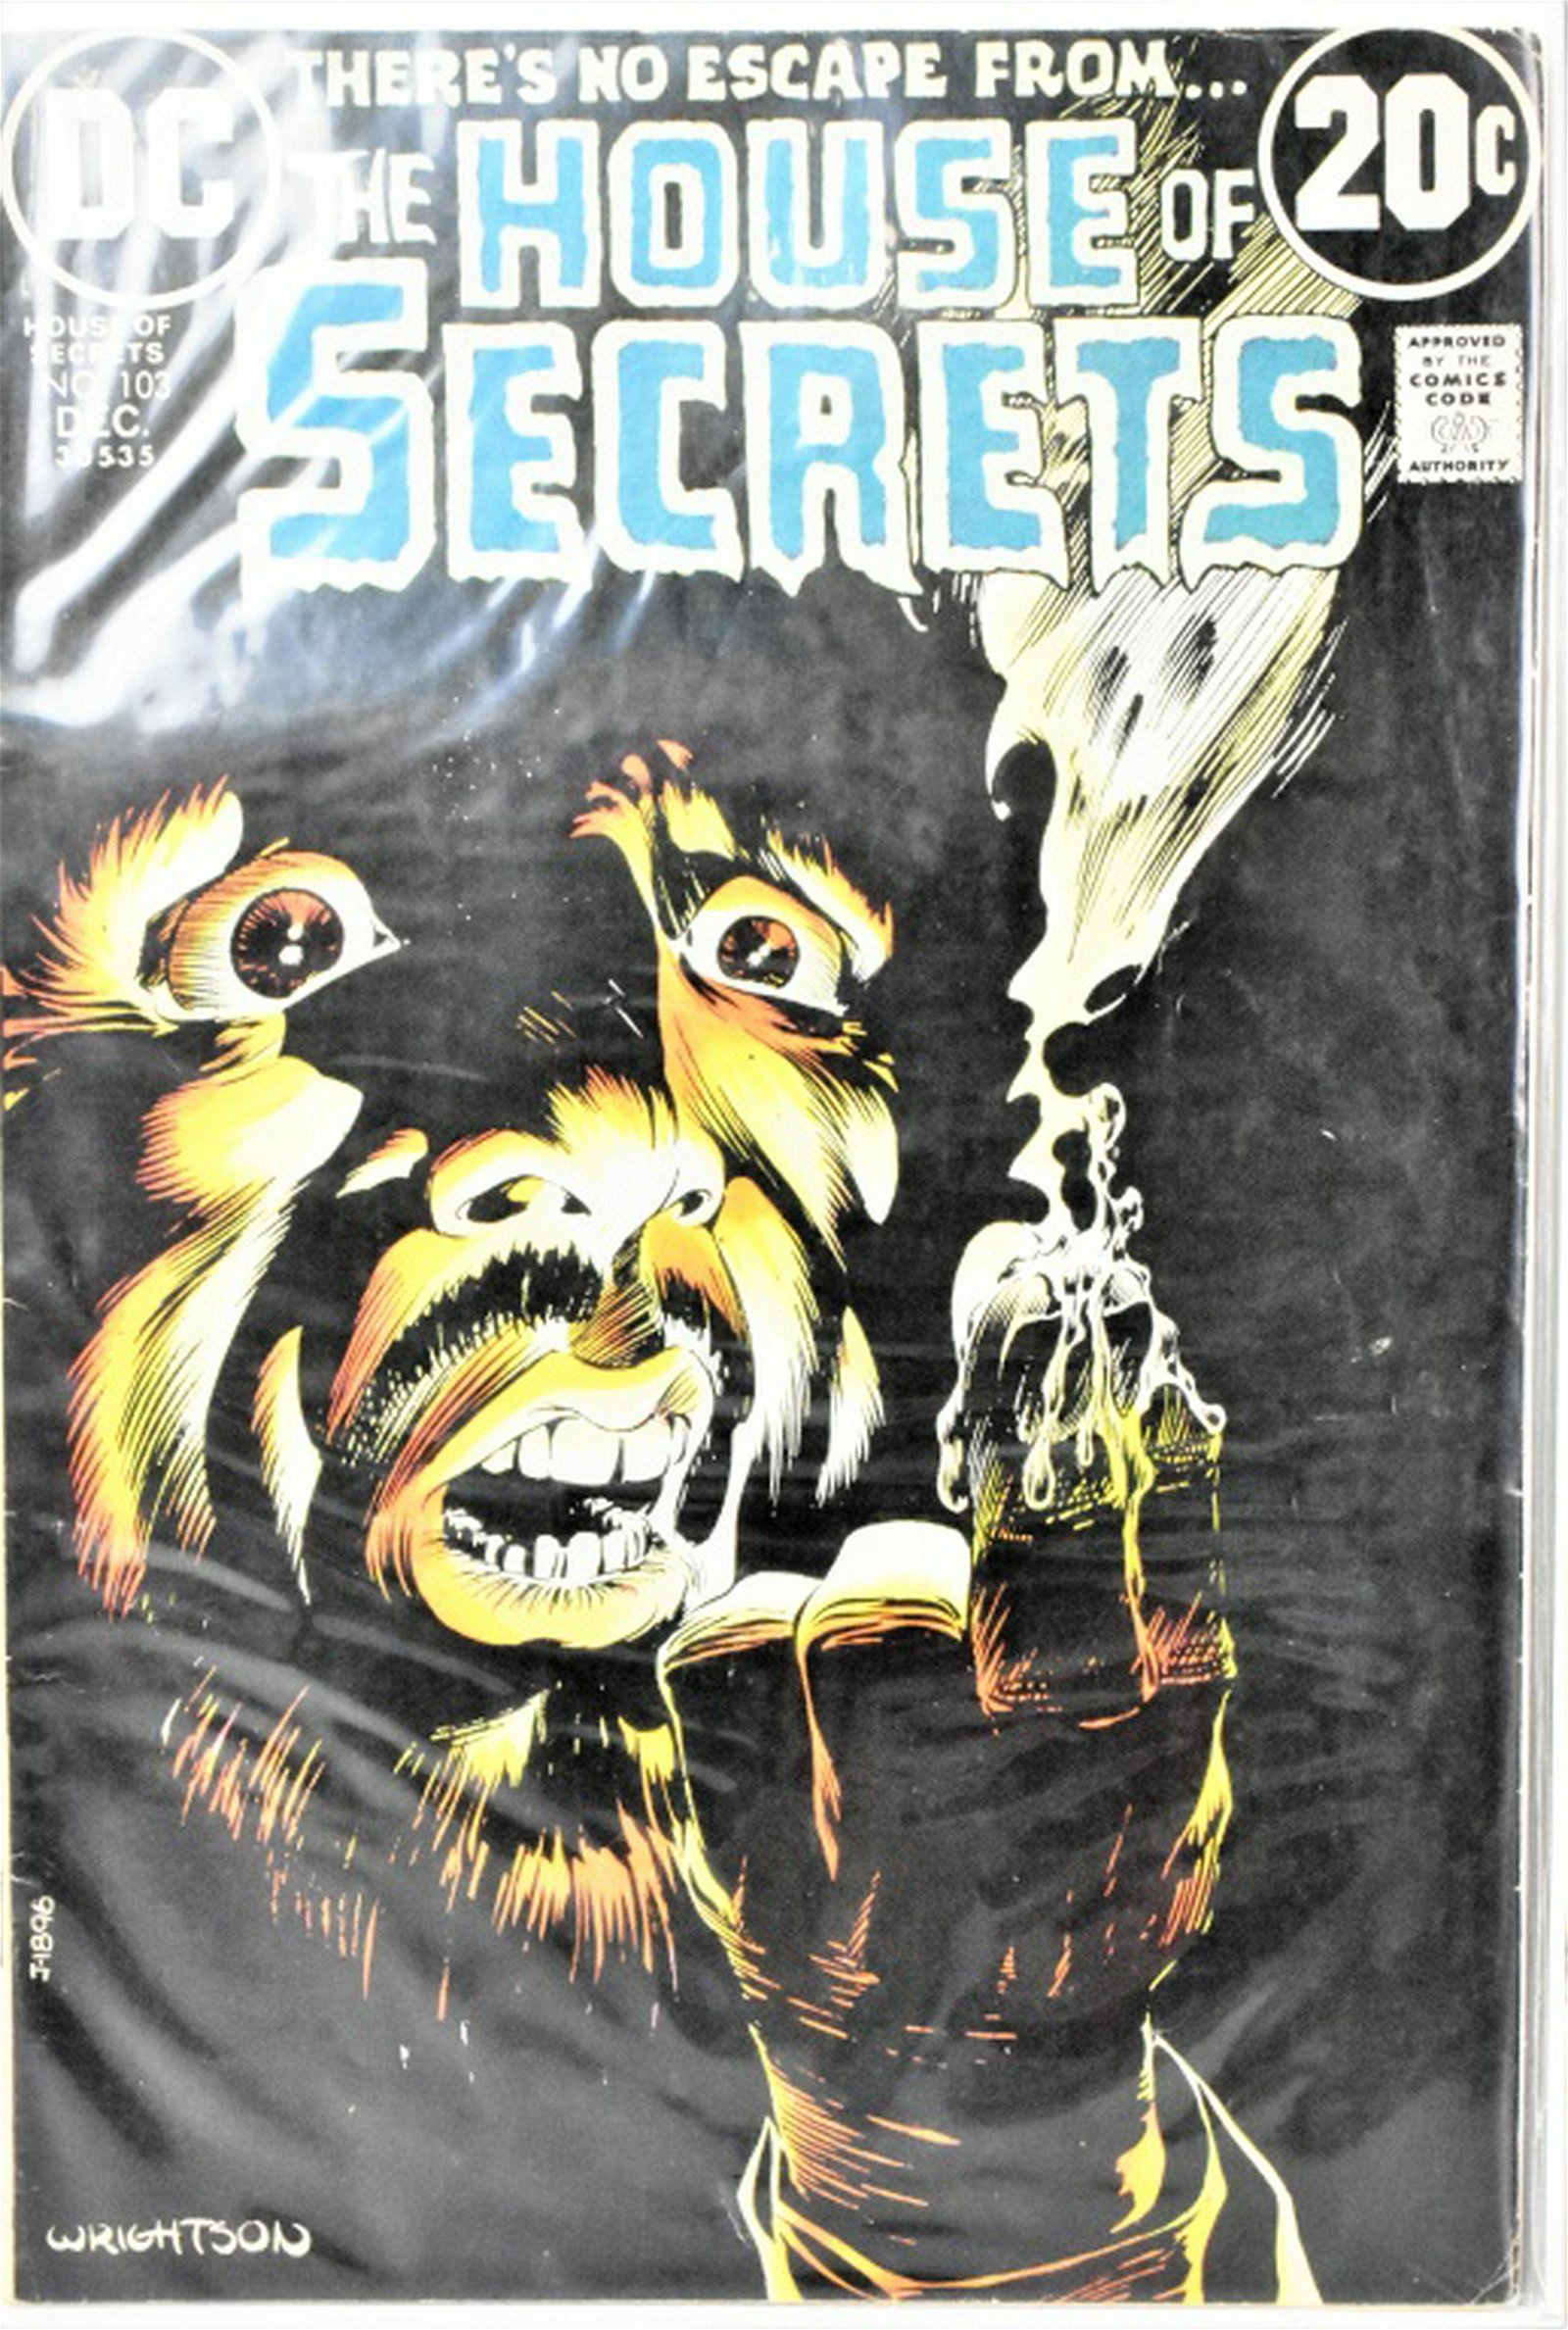 Assorted DC Horror Silver & Bronze Age Comics